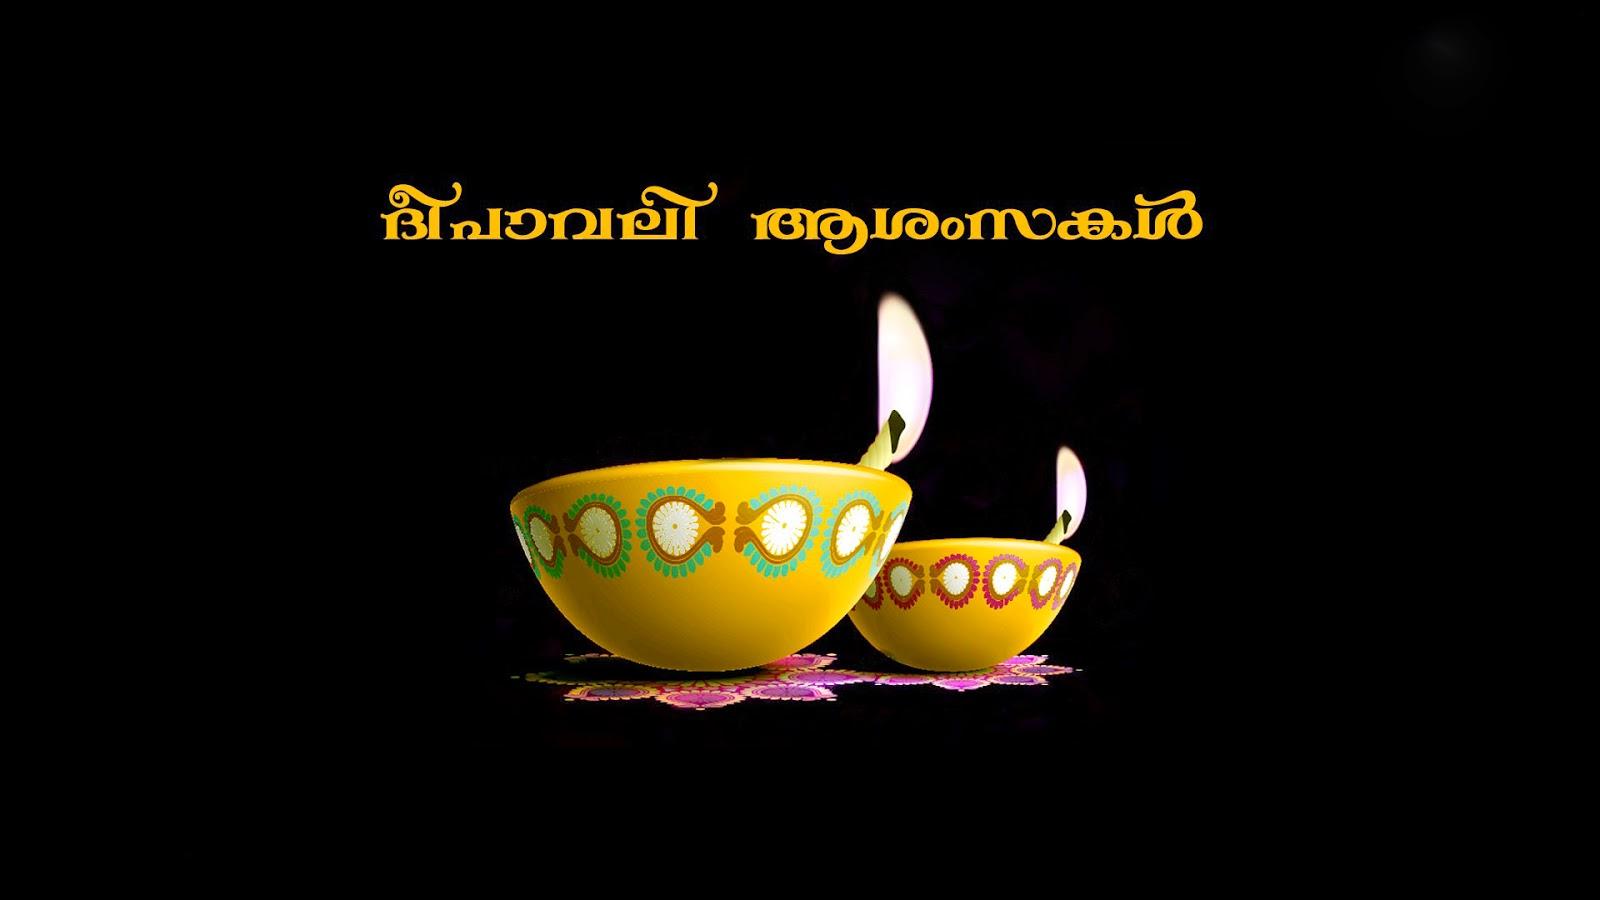 Happy diwali 2015 diwali festival 2015 wallpapers sms videos diwali wallpaper 2015 m4hsunfo